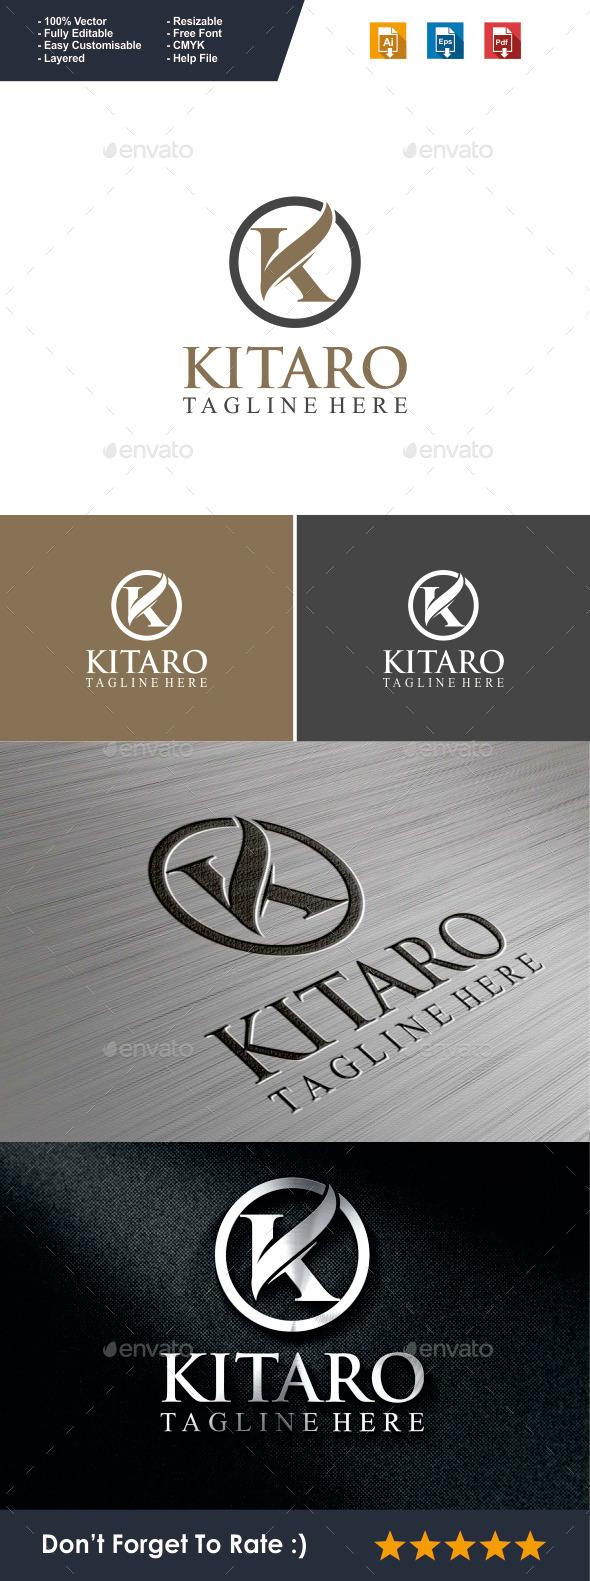 Letter K Logo - Kitaro - Letters Logo Templates